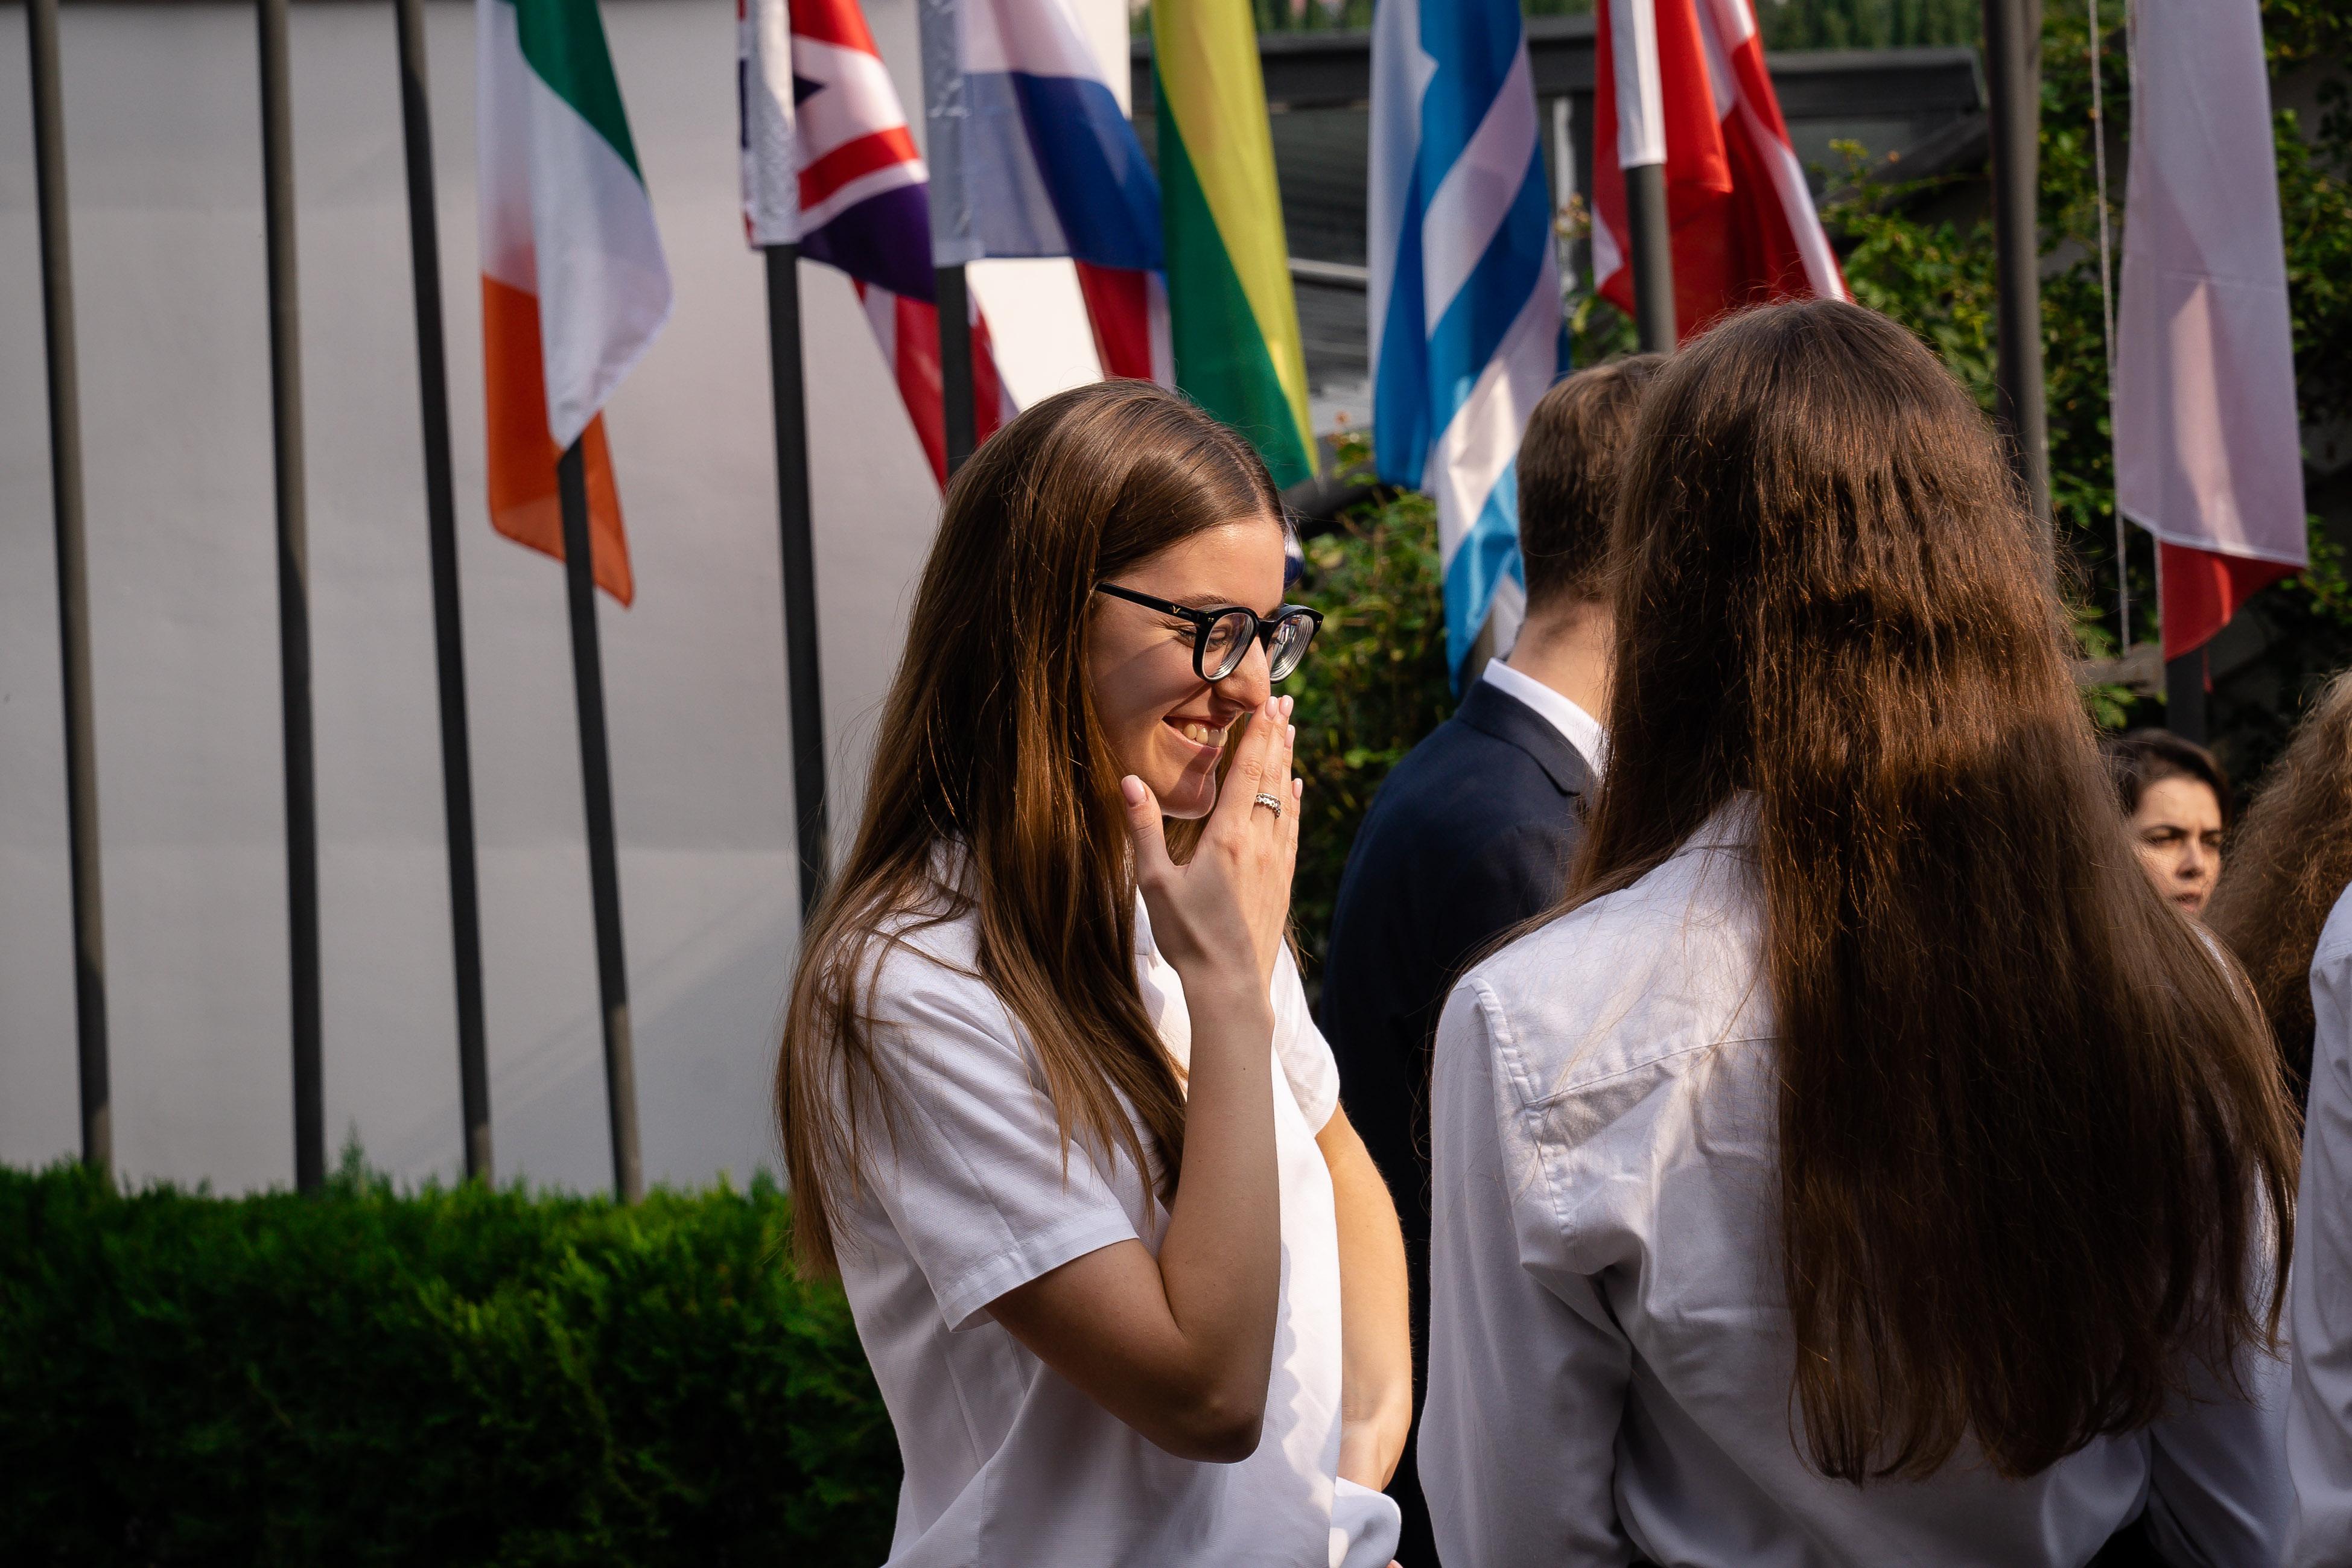 EaP_European_School-02136